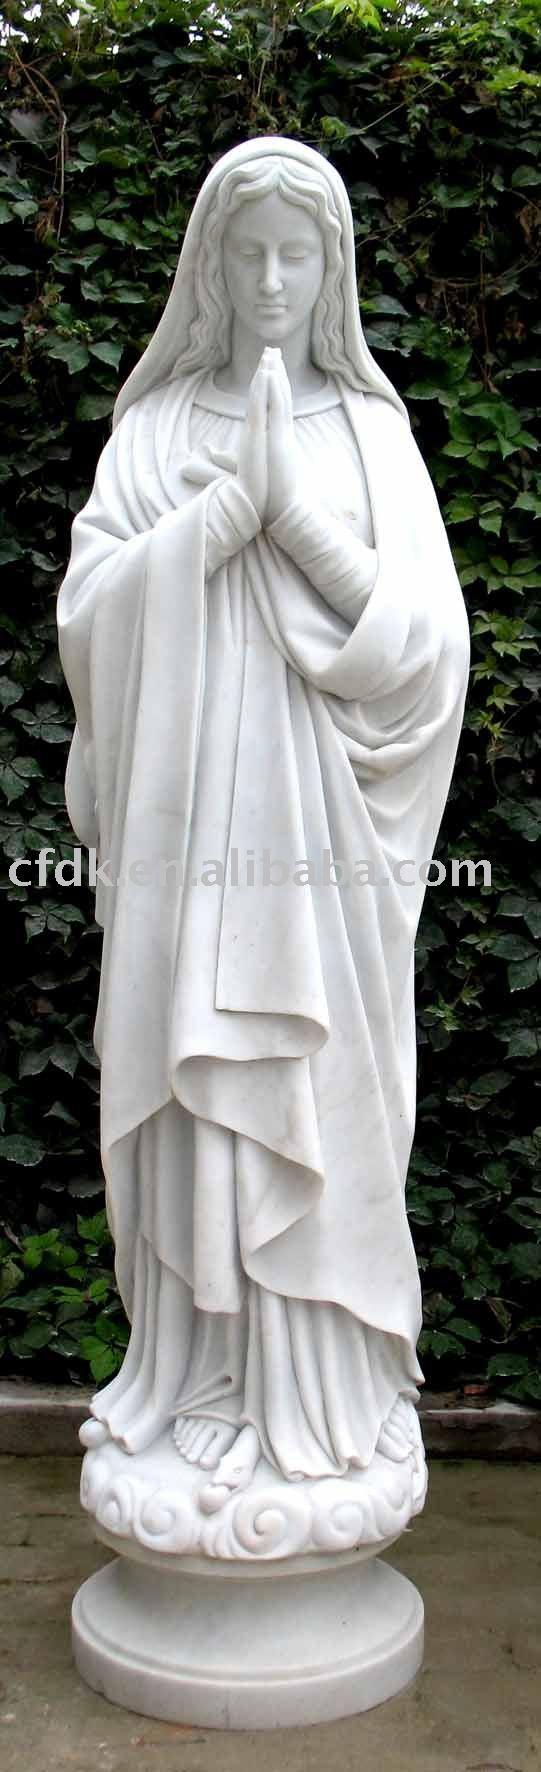 statue vierge marie en vente - Statues eBay